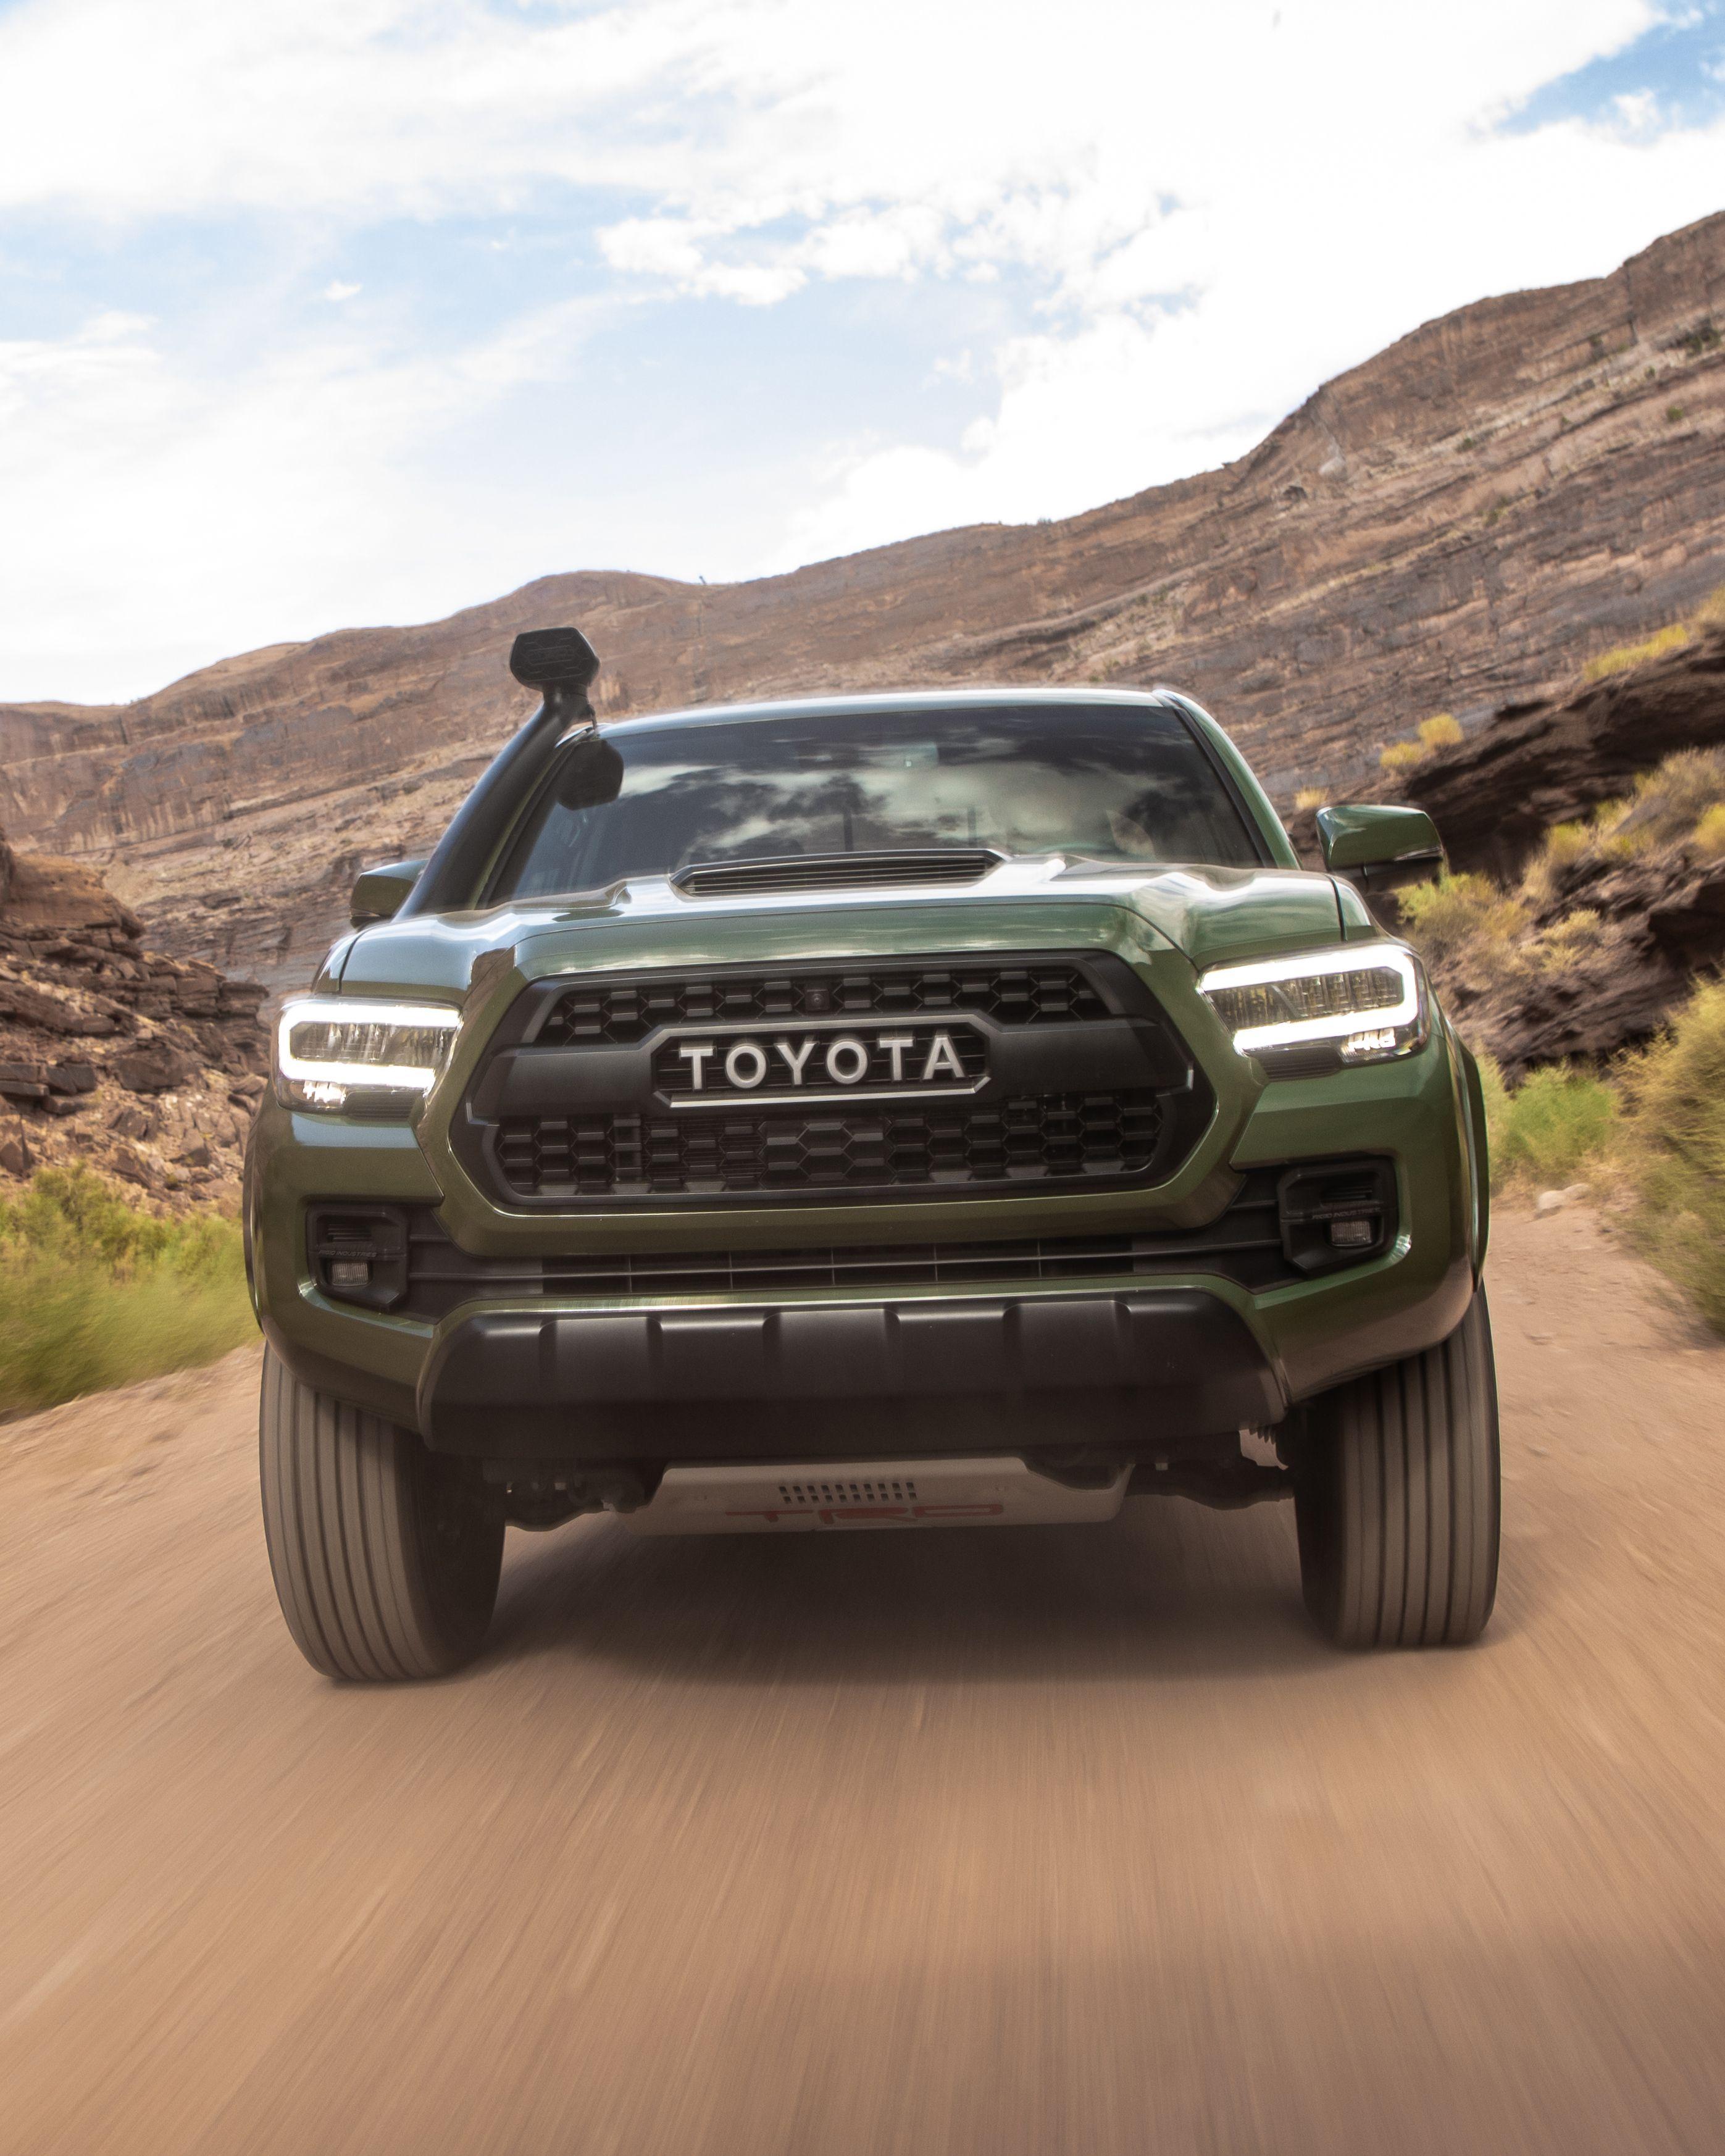 The 2020 Toyota Tacoma Trd Pro Goes Where Few Trucks Can Toyota Tacoma Trd Pro Toyota Tacoma Trd Tacoma Trd